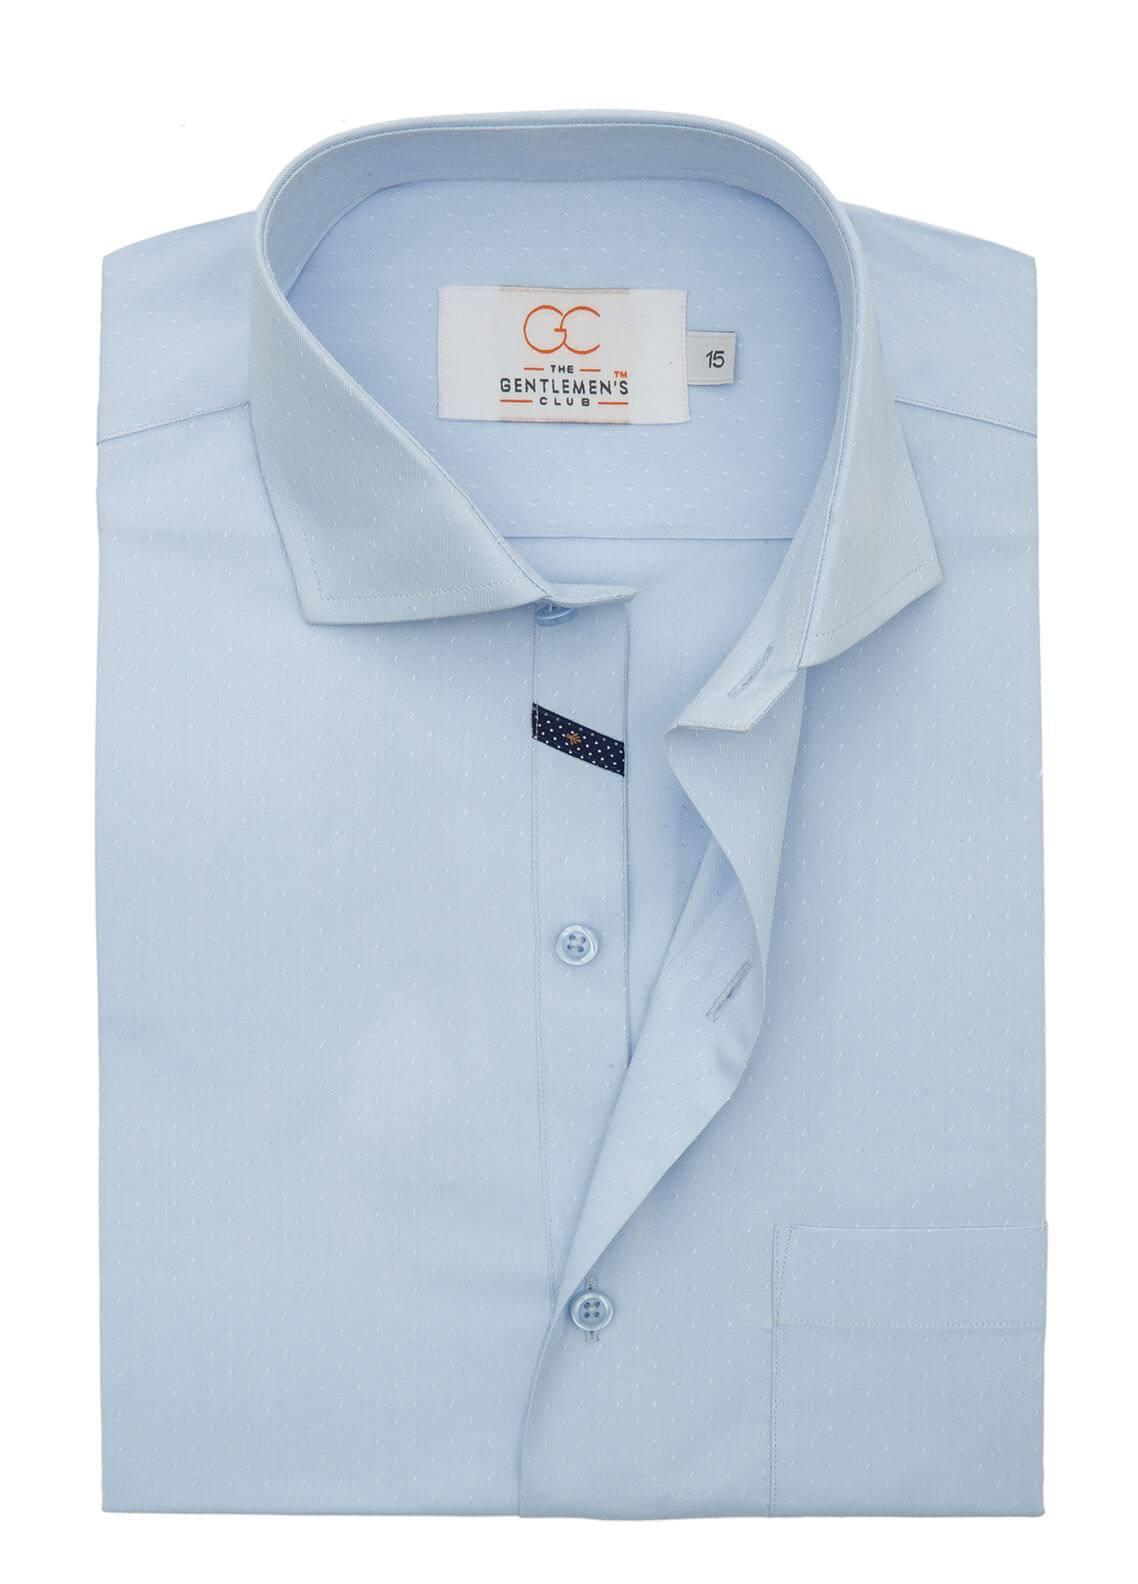 The Gentlemen's Club Cotton Formal Men Shirts - Sky Blue White Label 4079 - 18.5